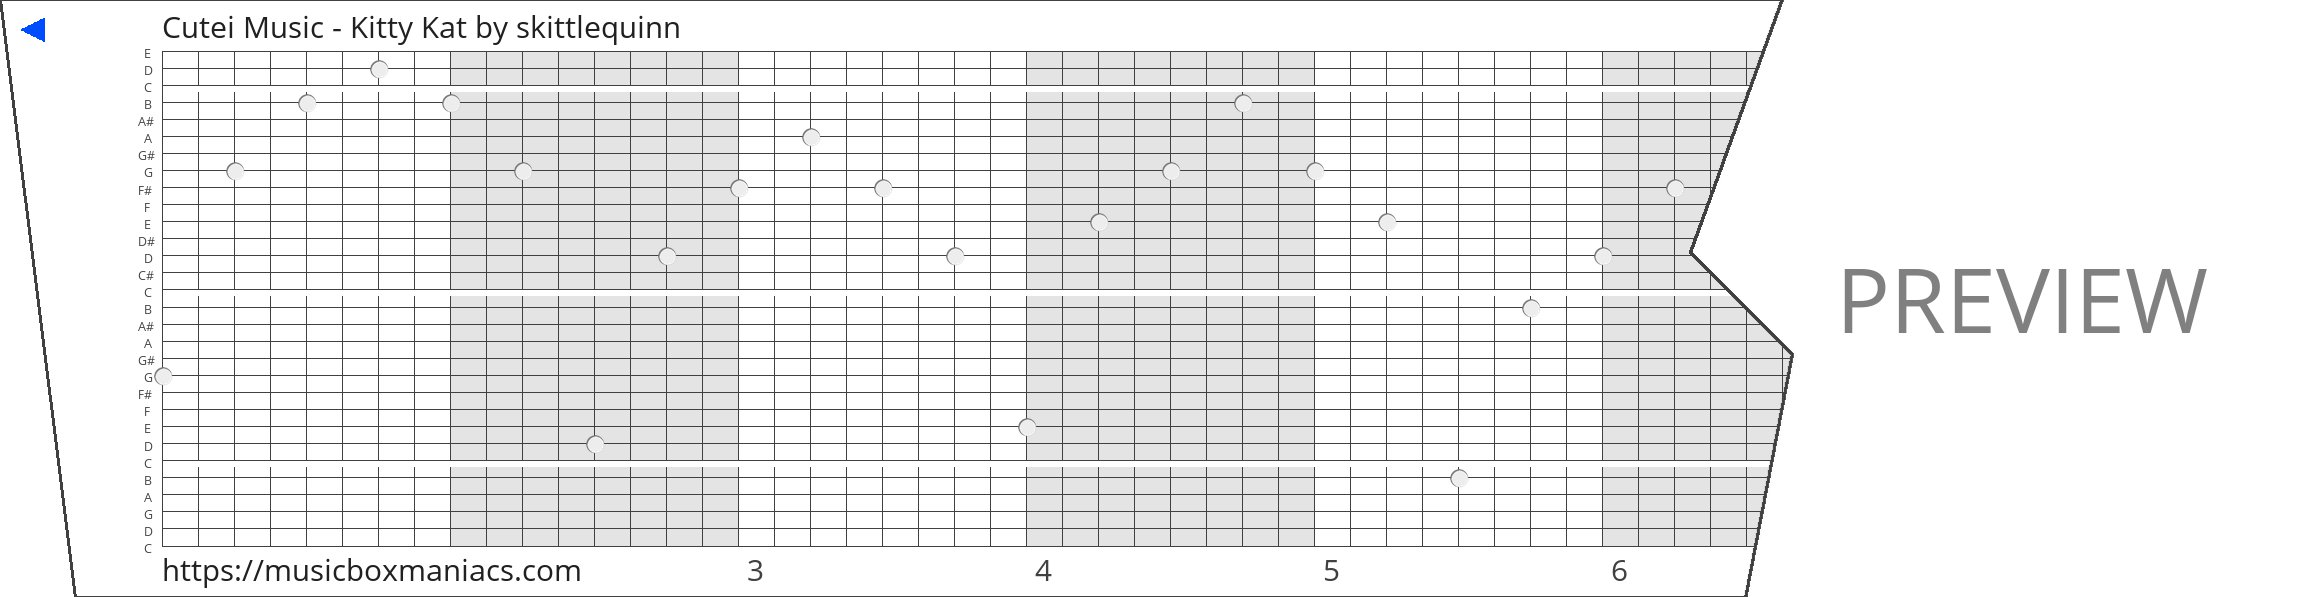 Cutei Music - Kitty Kat 30 note music box paper strip